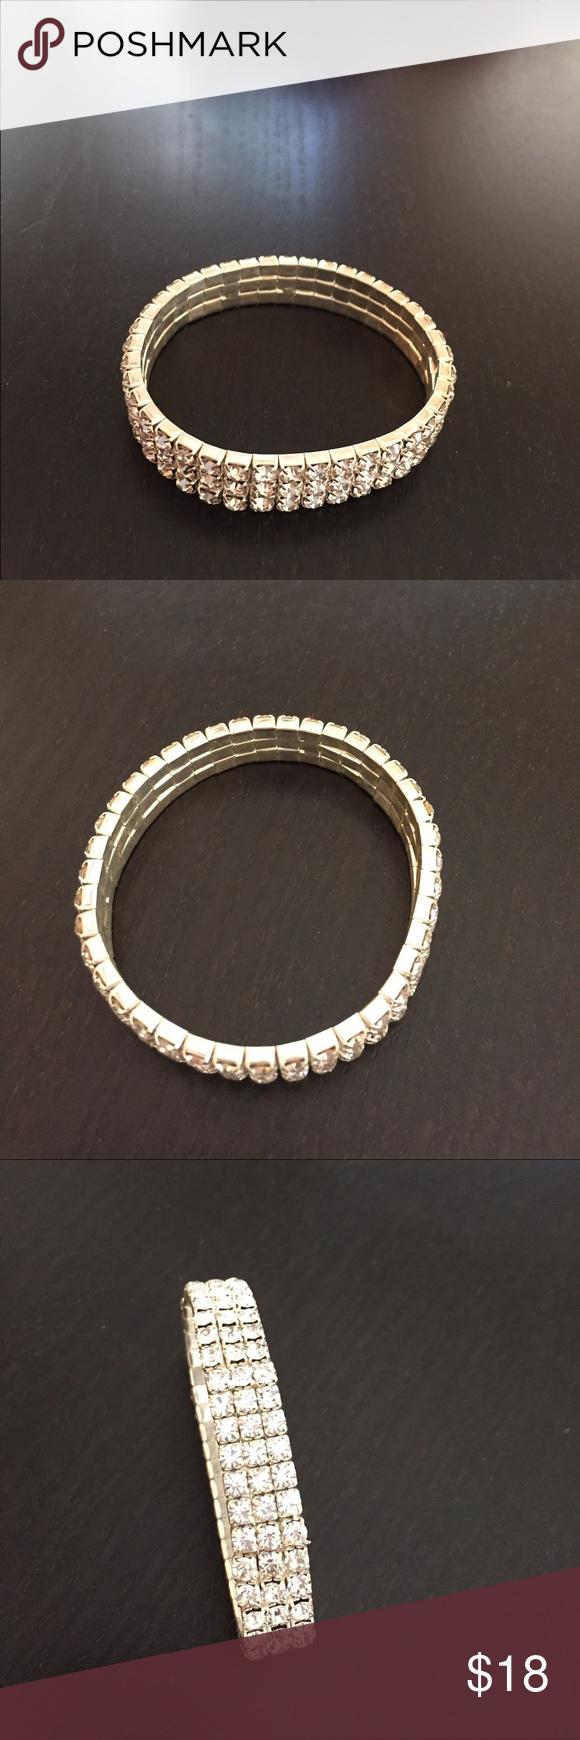 Silver bracelet Has rhinestones,never used Jewelry Bracelets